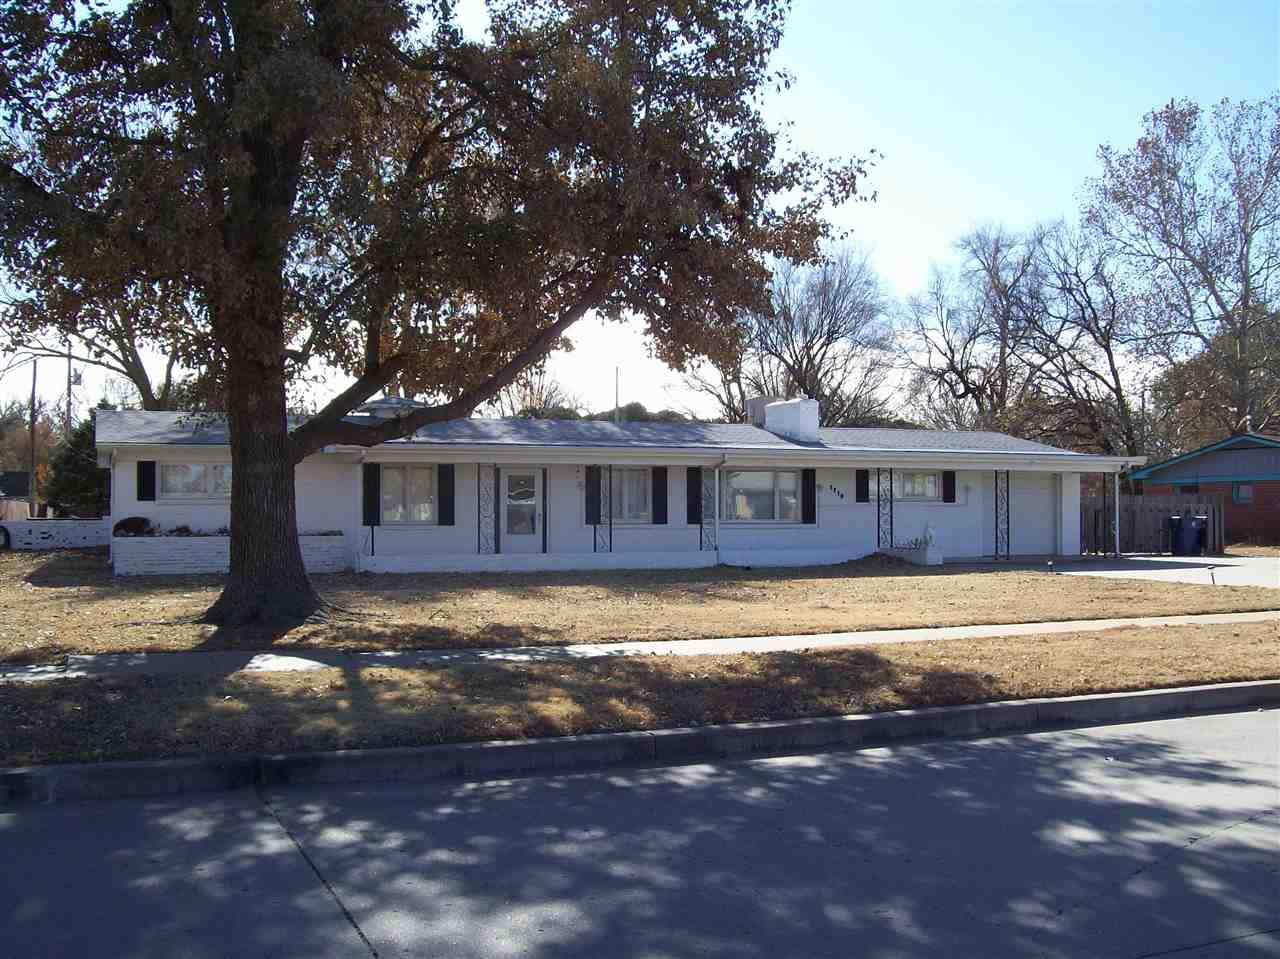 Estate sale Dec. 6th & 7th. No showing until Sunday Dec. 8th. 1839 sq ft. brick ranch on short half